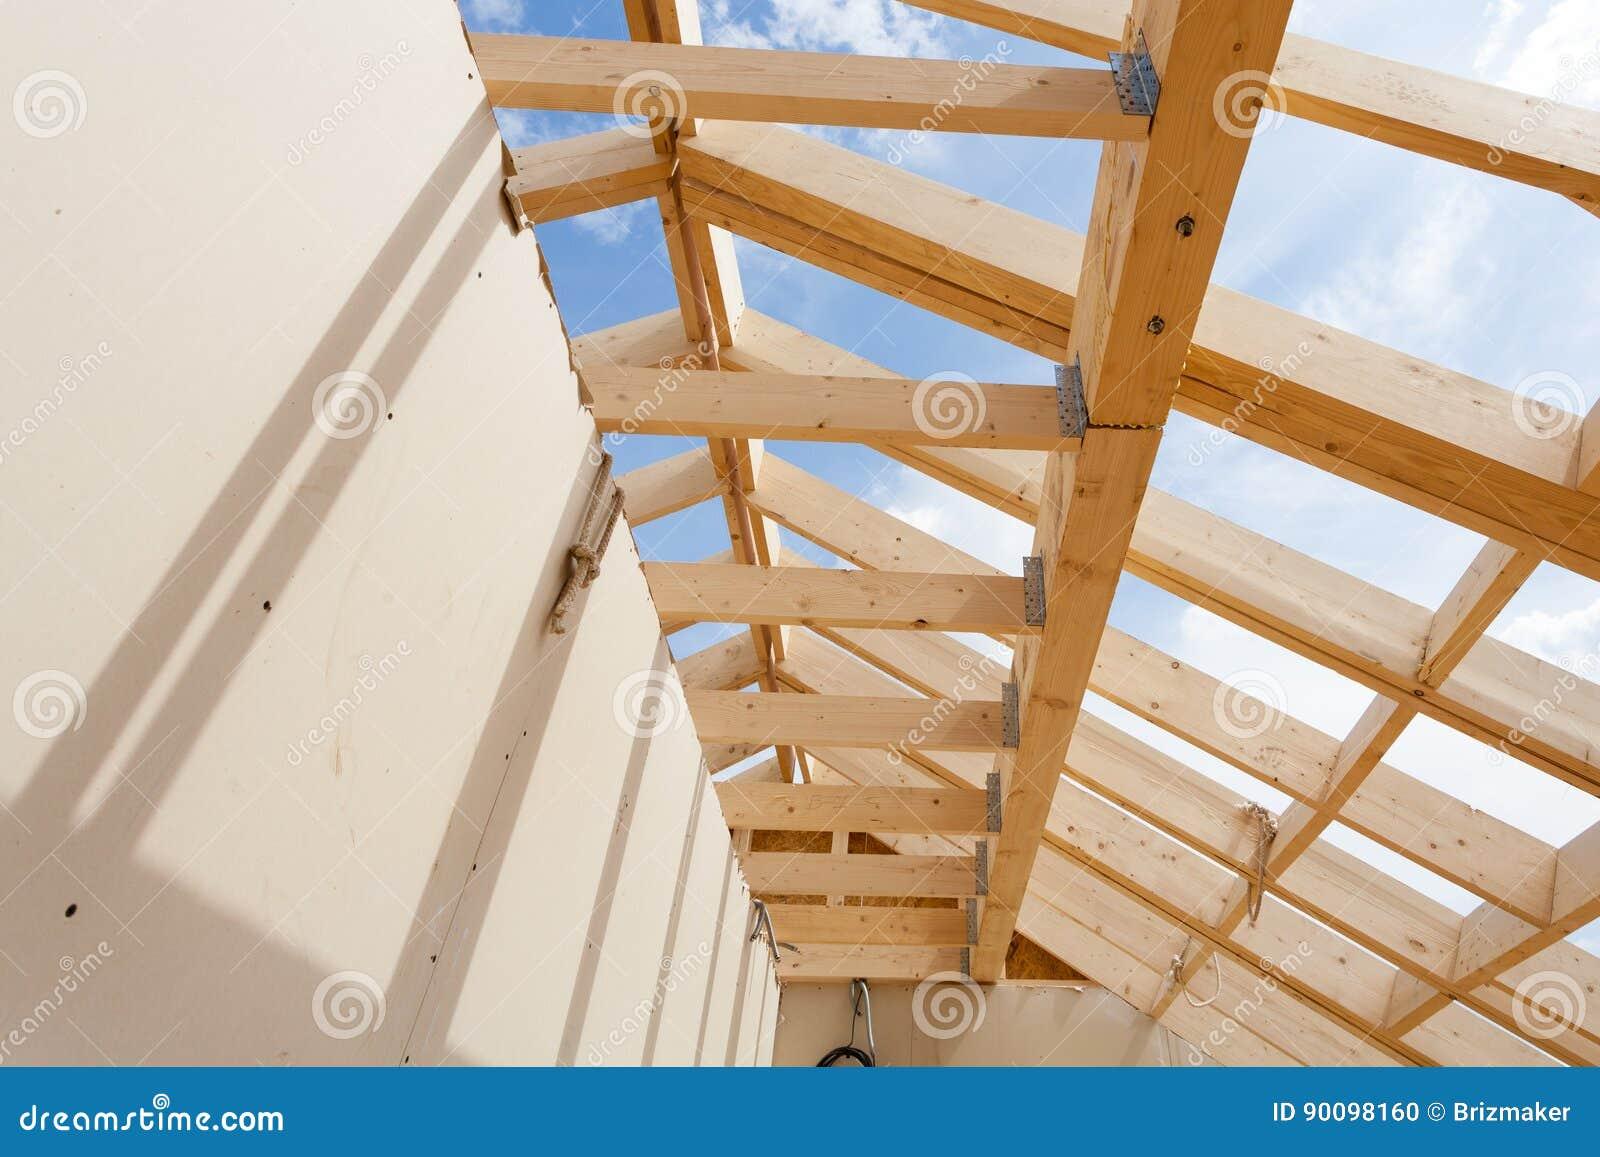 Neubauhauptgestaltung Gegen Blauen Himmel Nahaufnahme Des